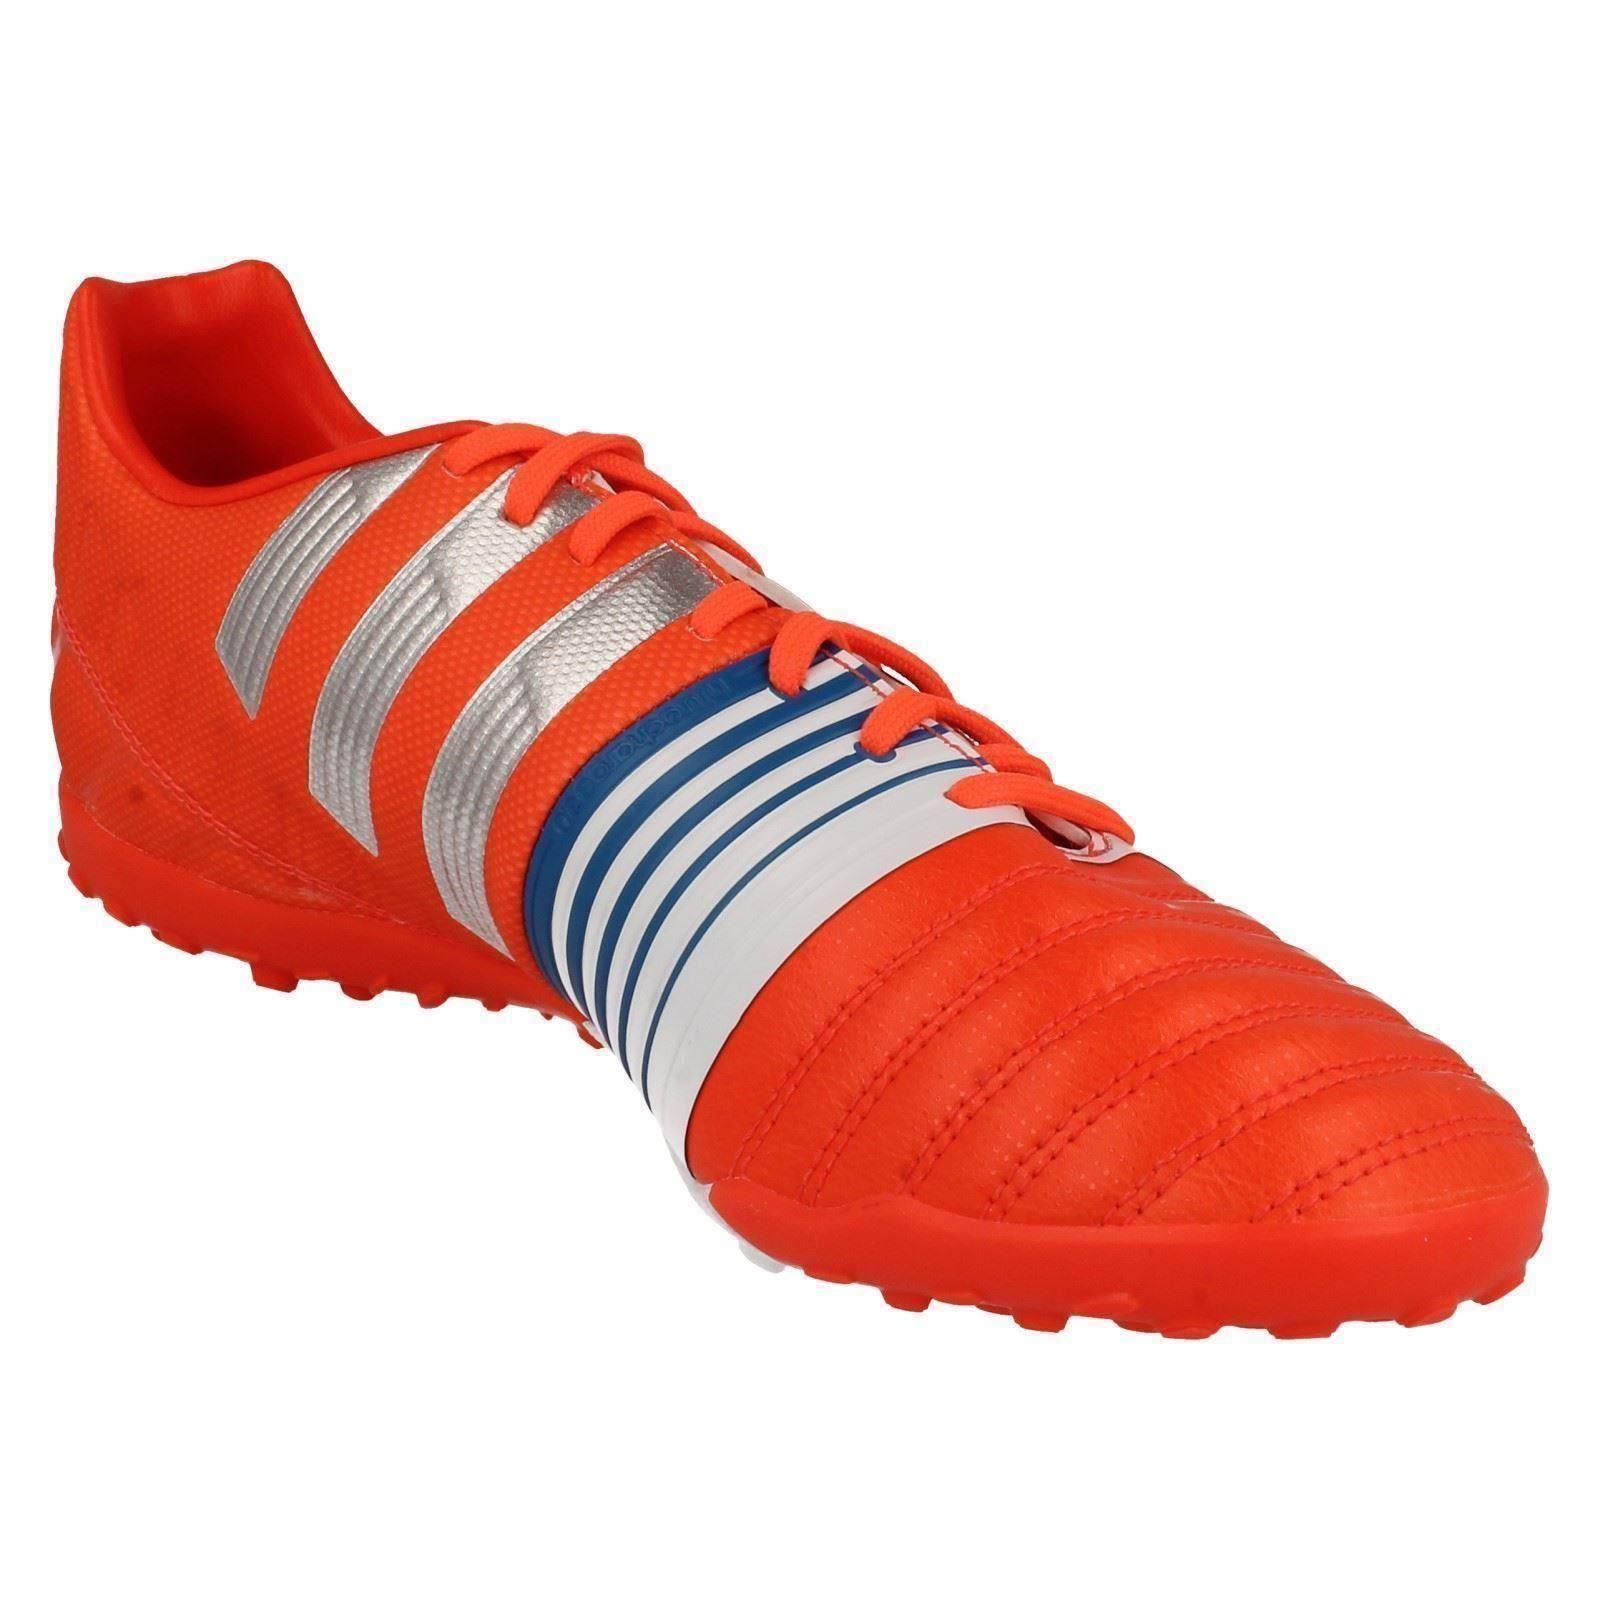 Mens adidas football formatori   nitrocharge 3,0 tf tf tf | Menu elegante e robusto  | Scolaro/Ragazze Scarpa  647921